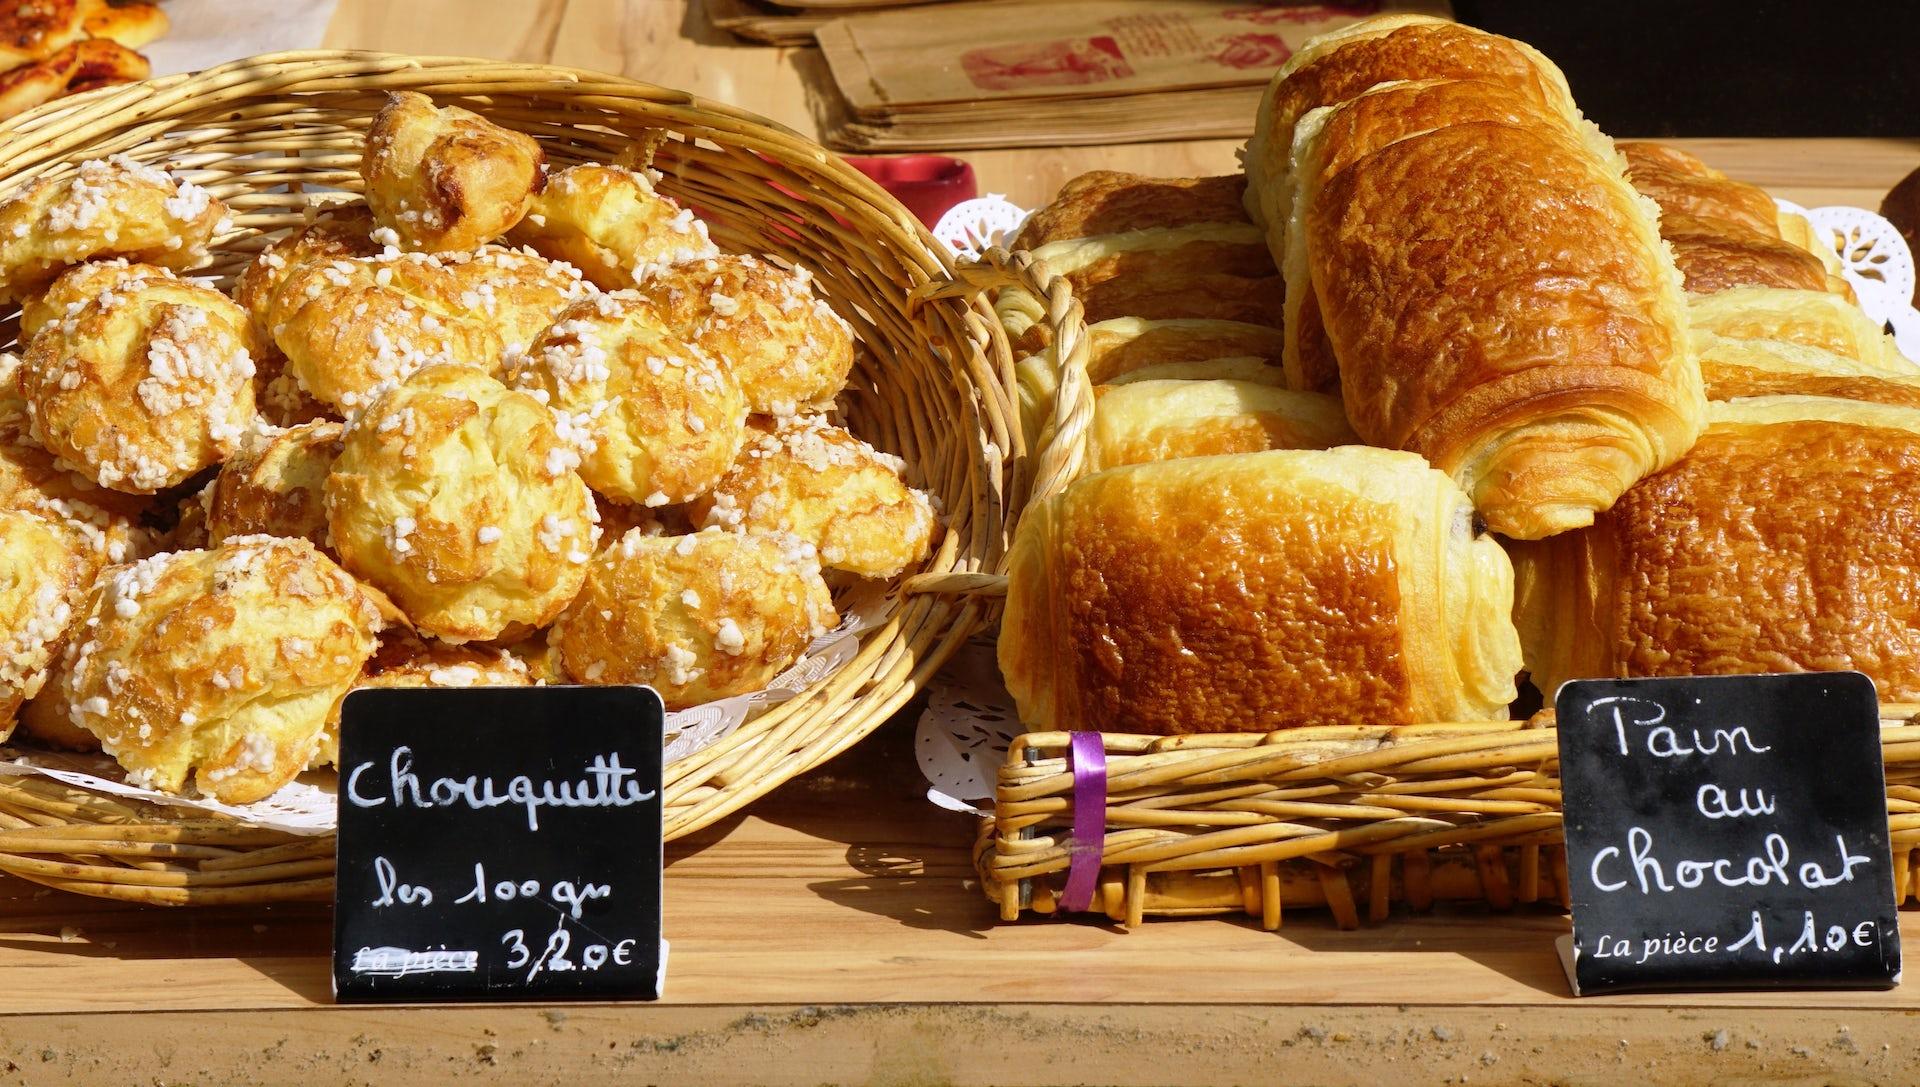 expats enjoy local foods